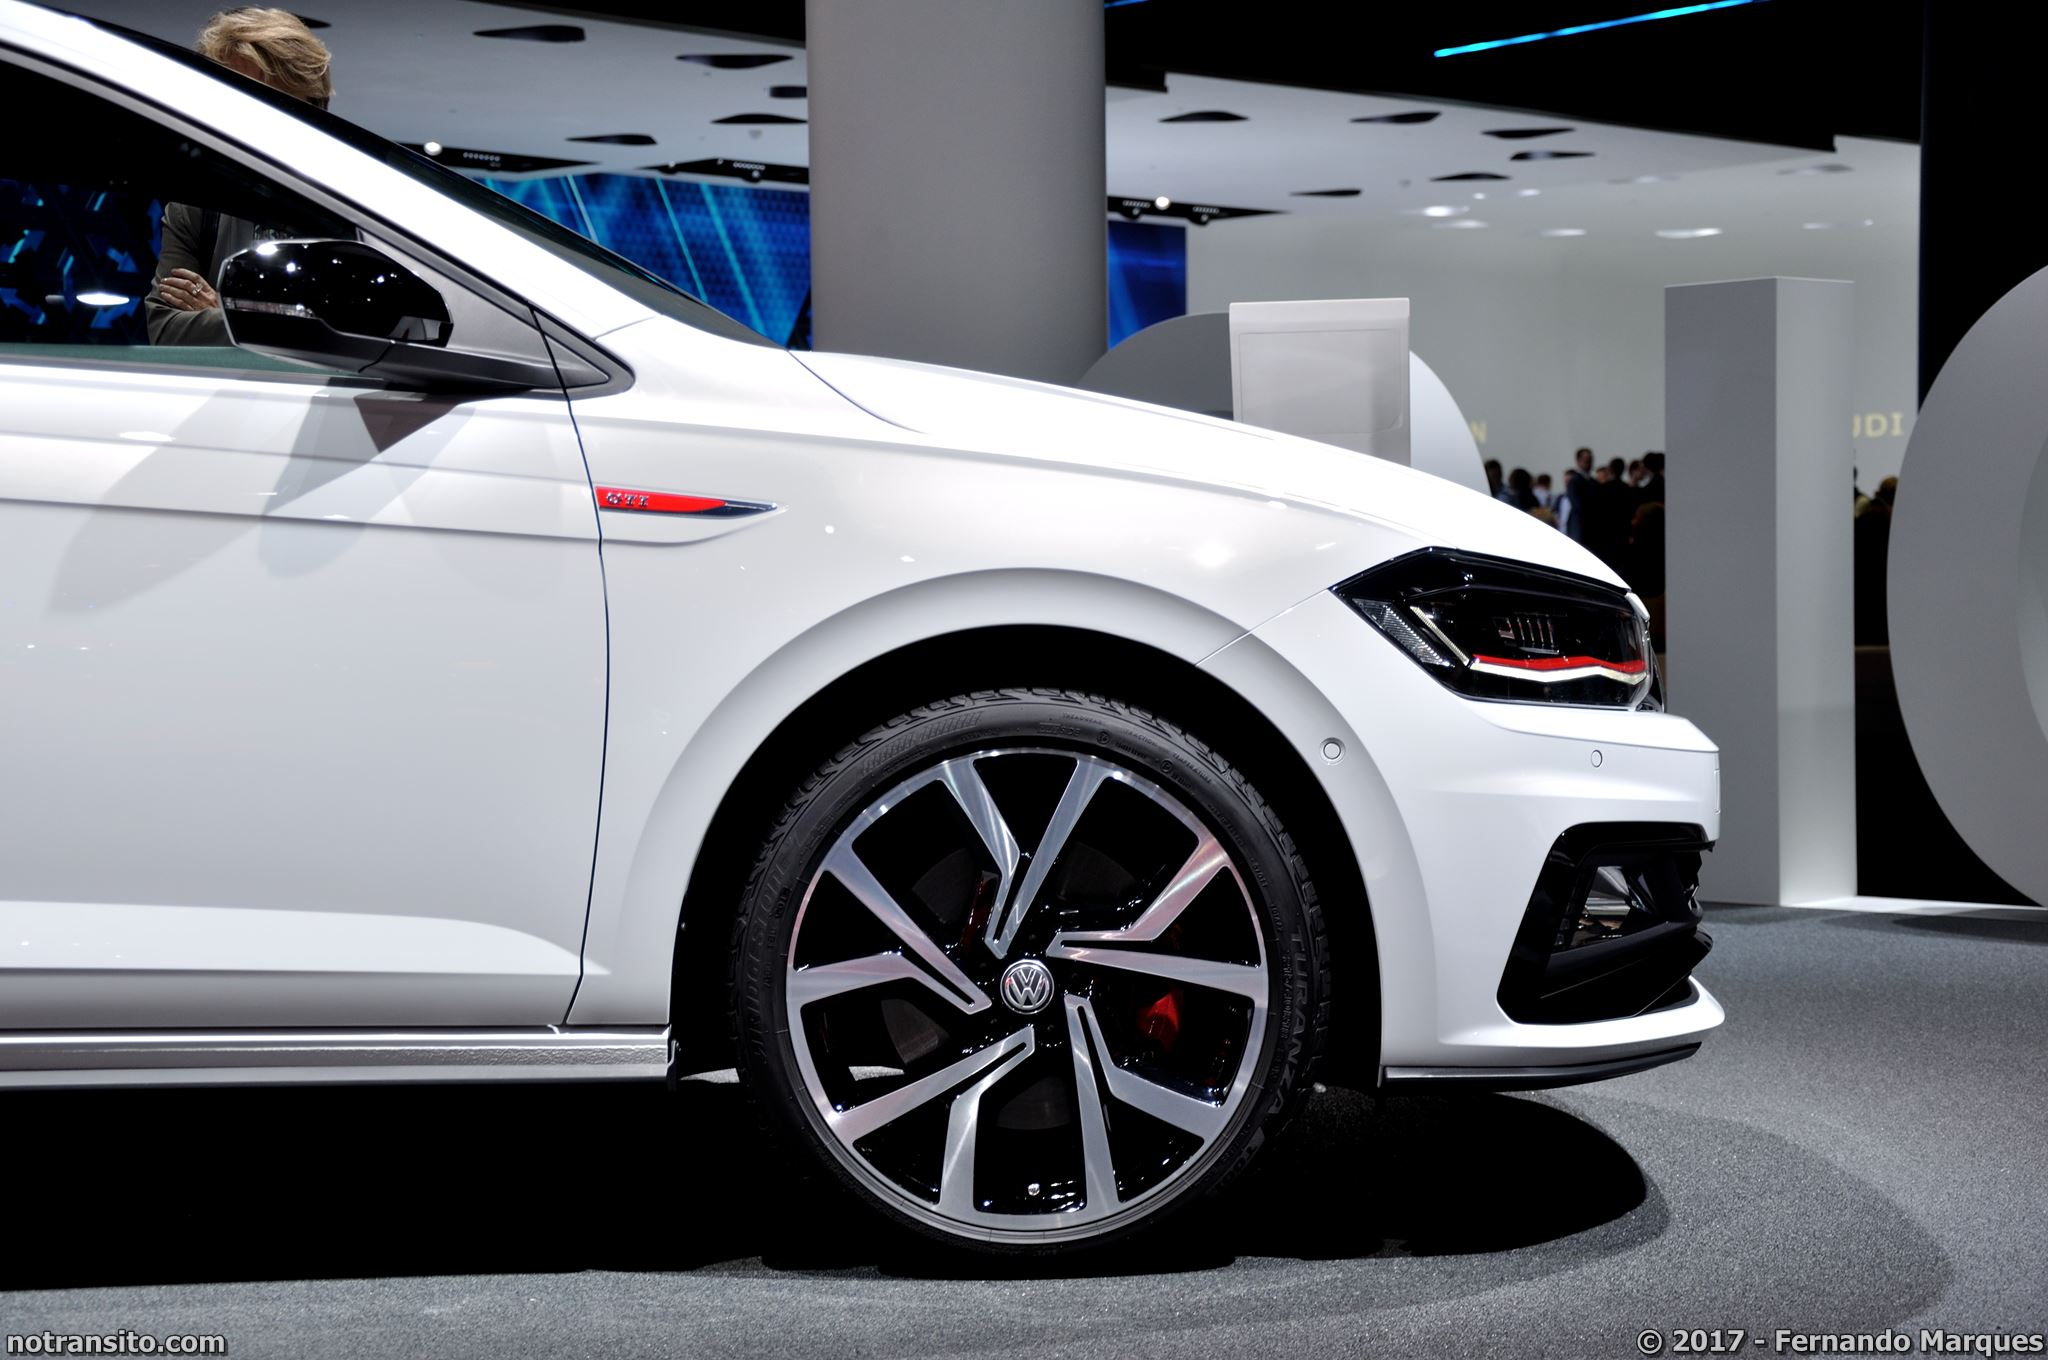 Volkswagen-Polo-GTI-Frankfurt-2017-007